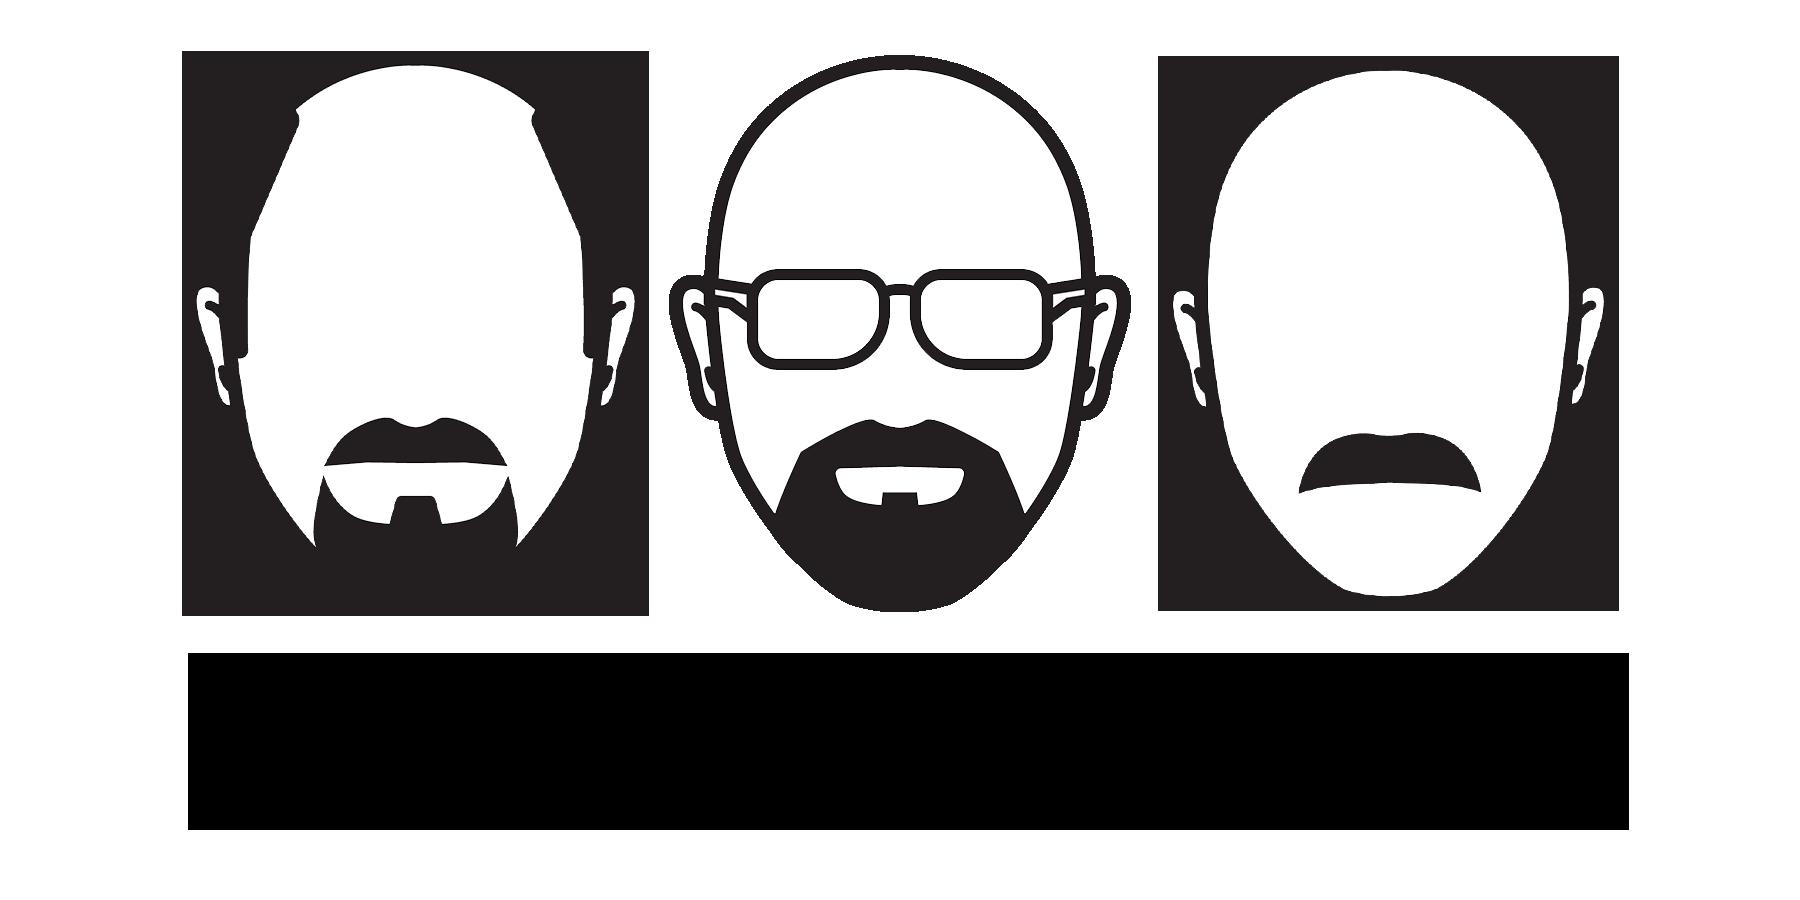 the-acquaintances-logo-with-name-black-t